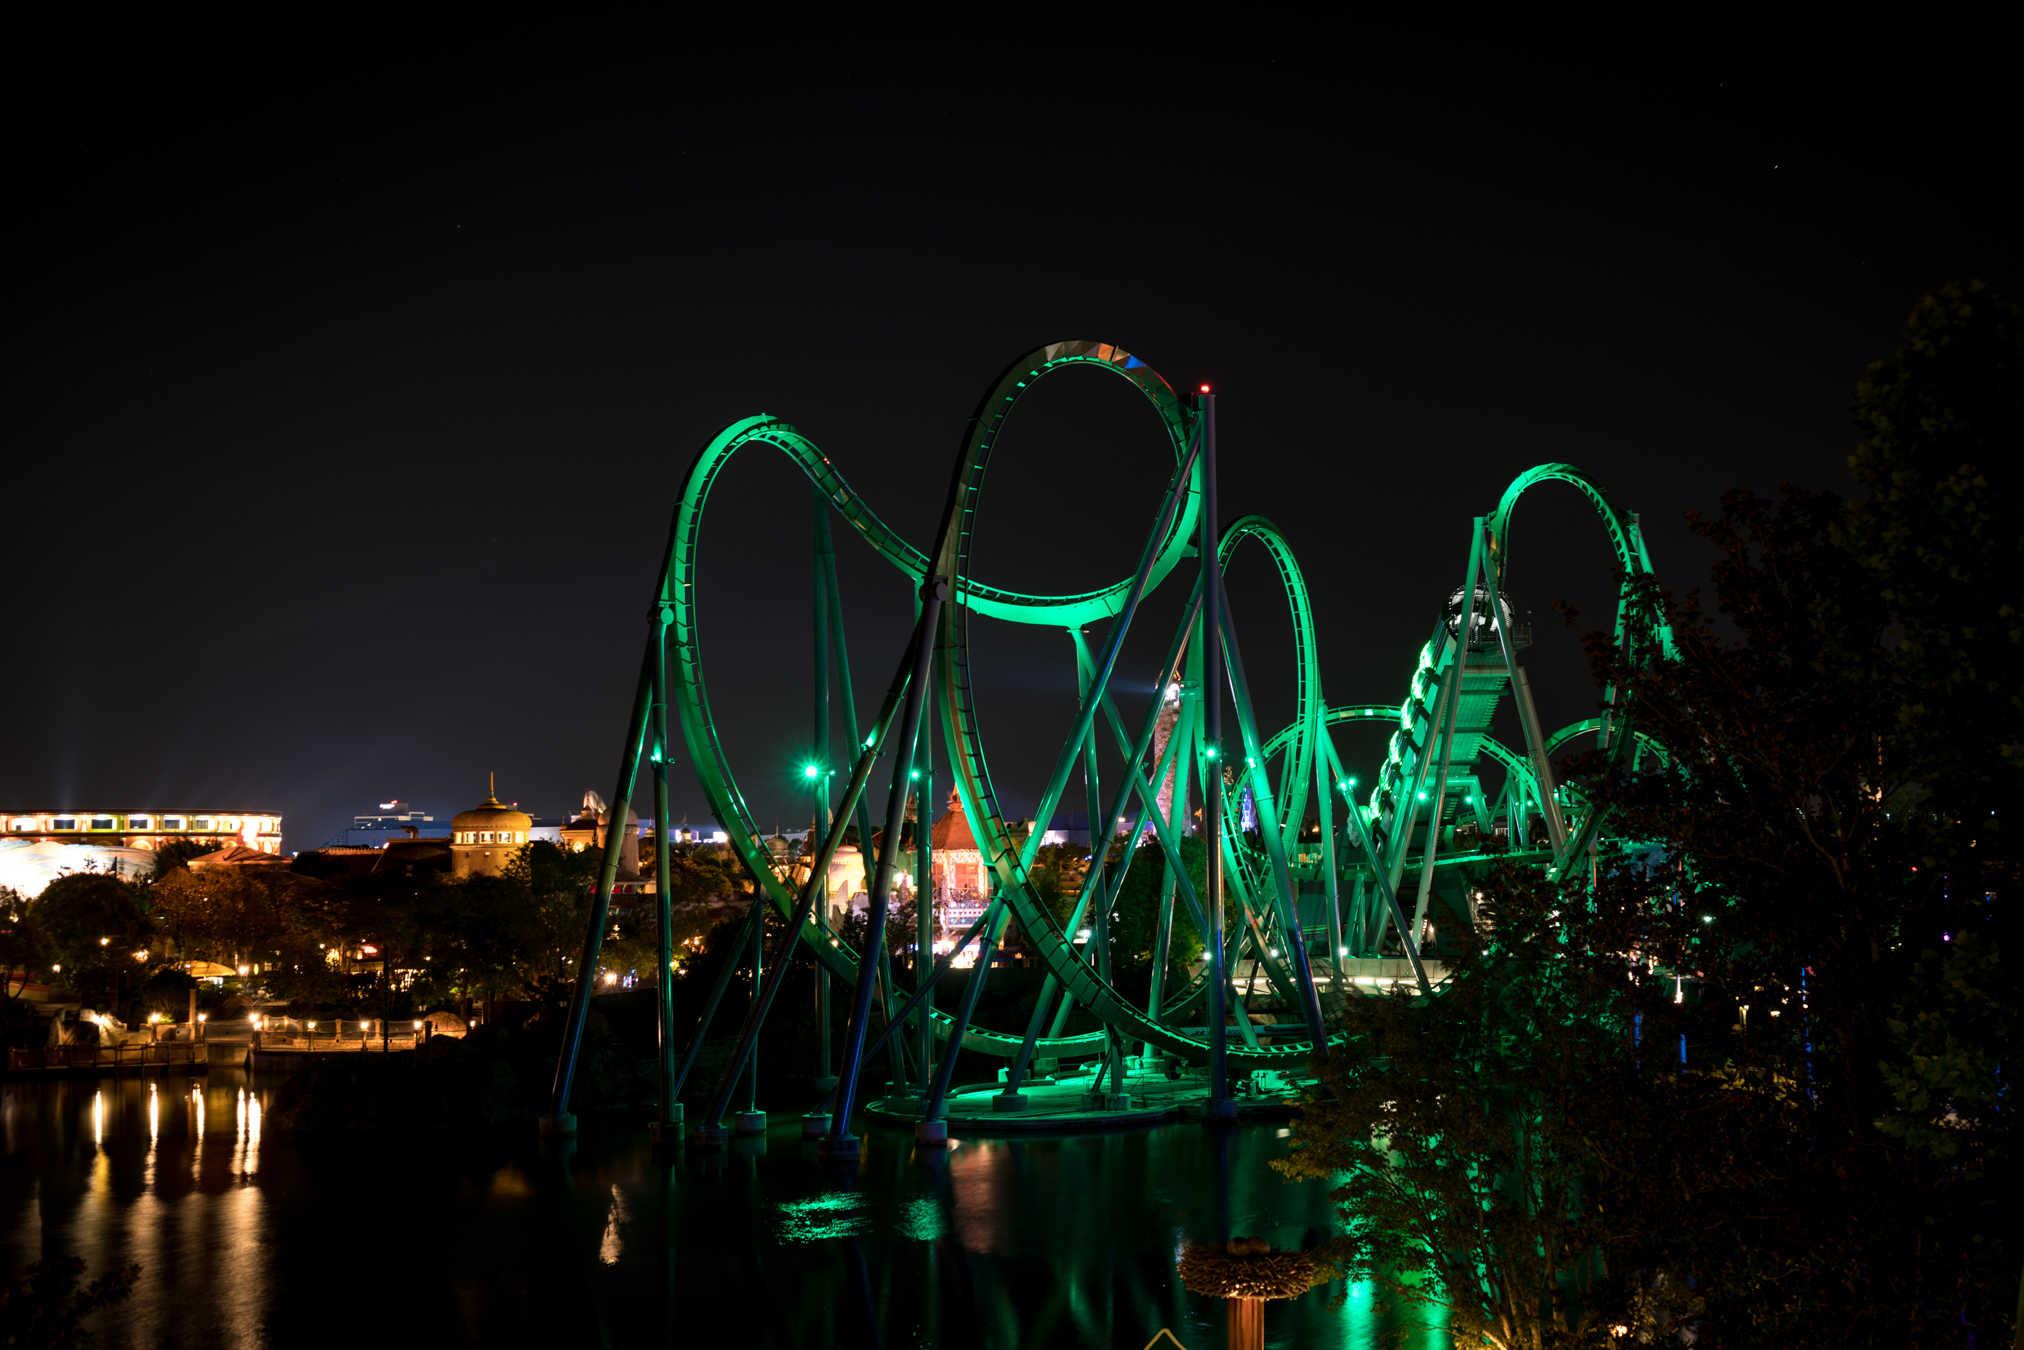 Incredible Hulk Coaster begins to roar back to life